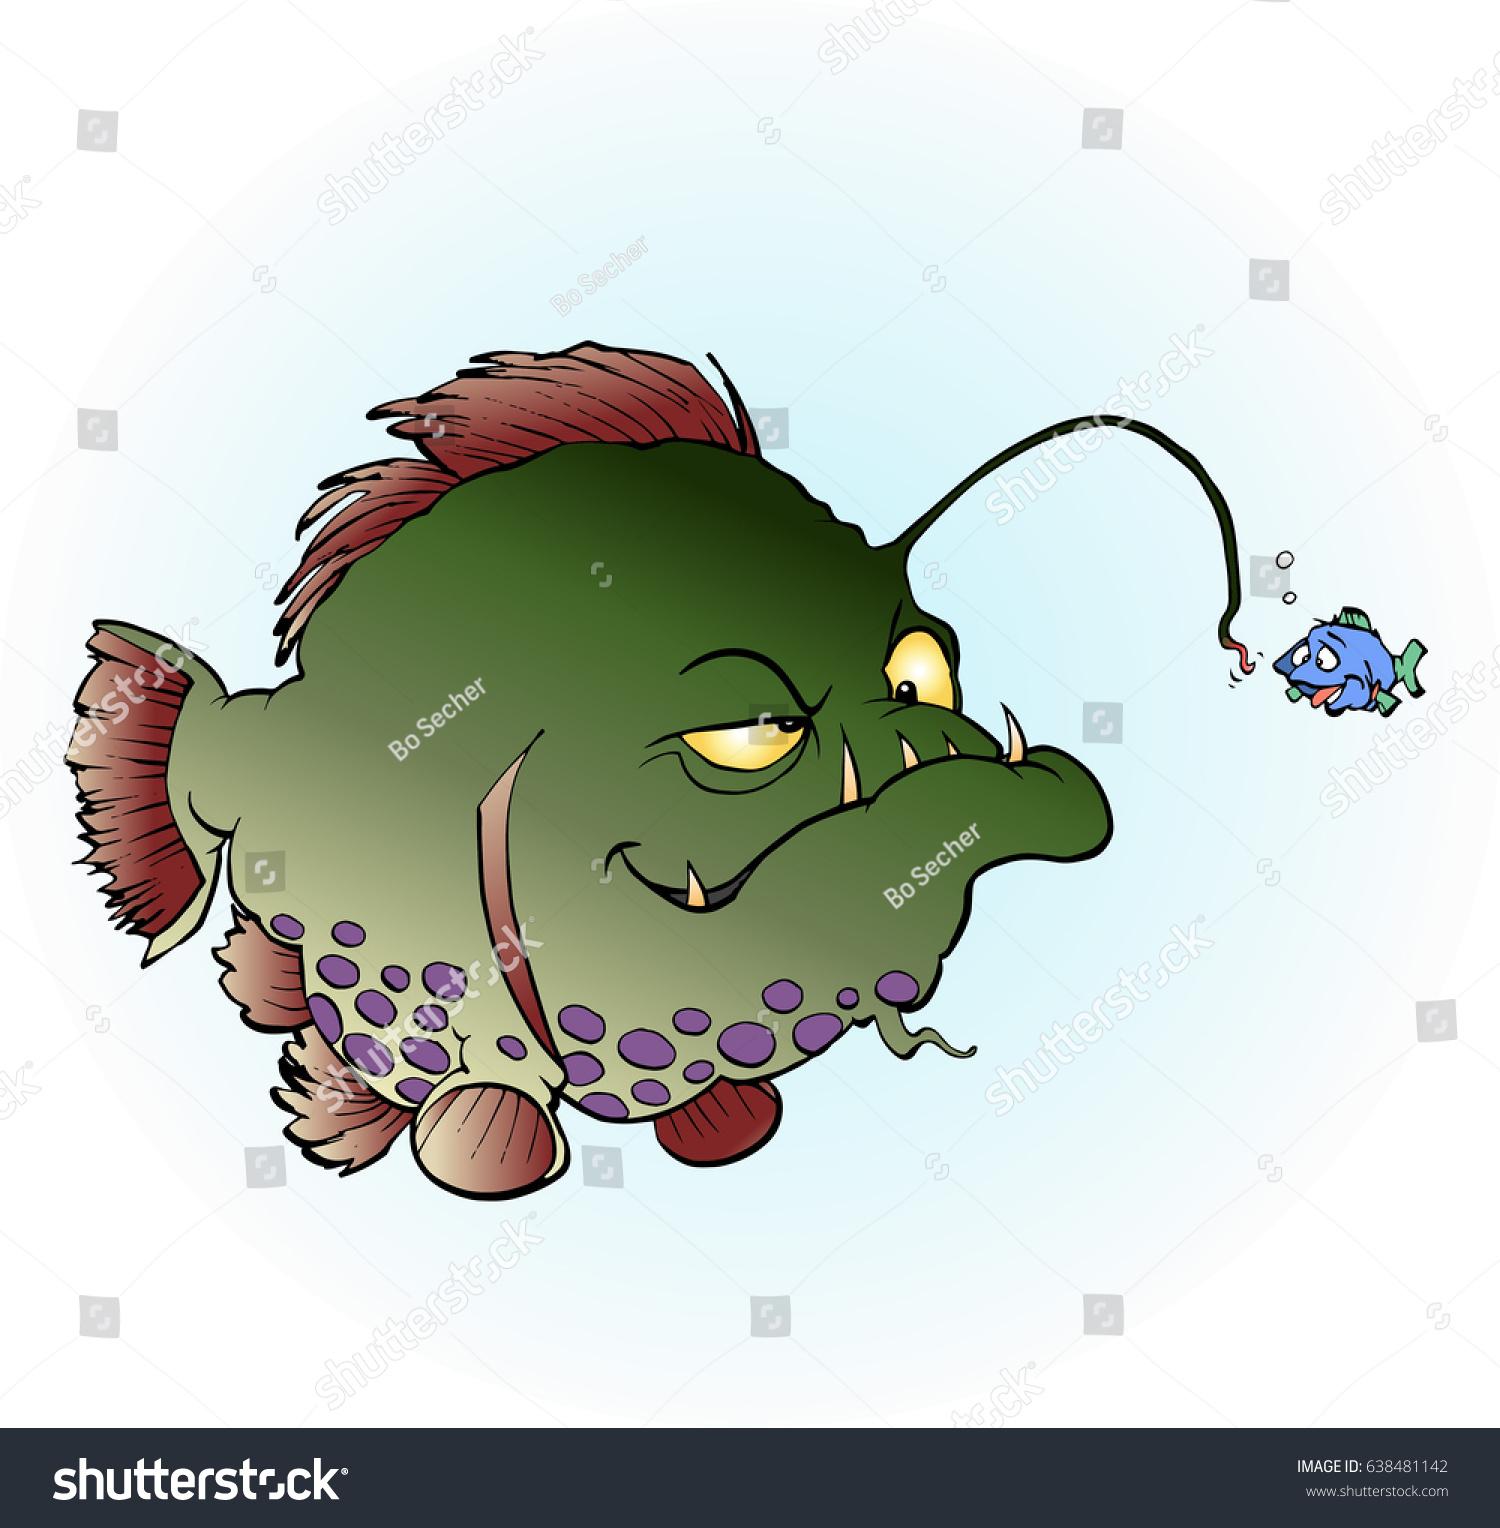 Big Fish Cheating Little Fish Cartoon Stock Vector (Royalty Free ...